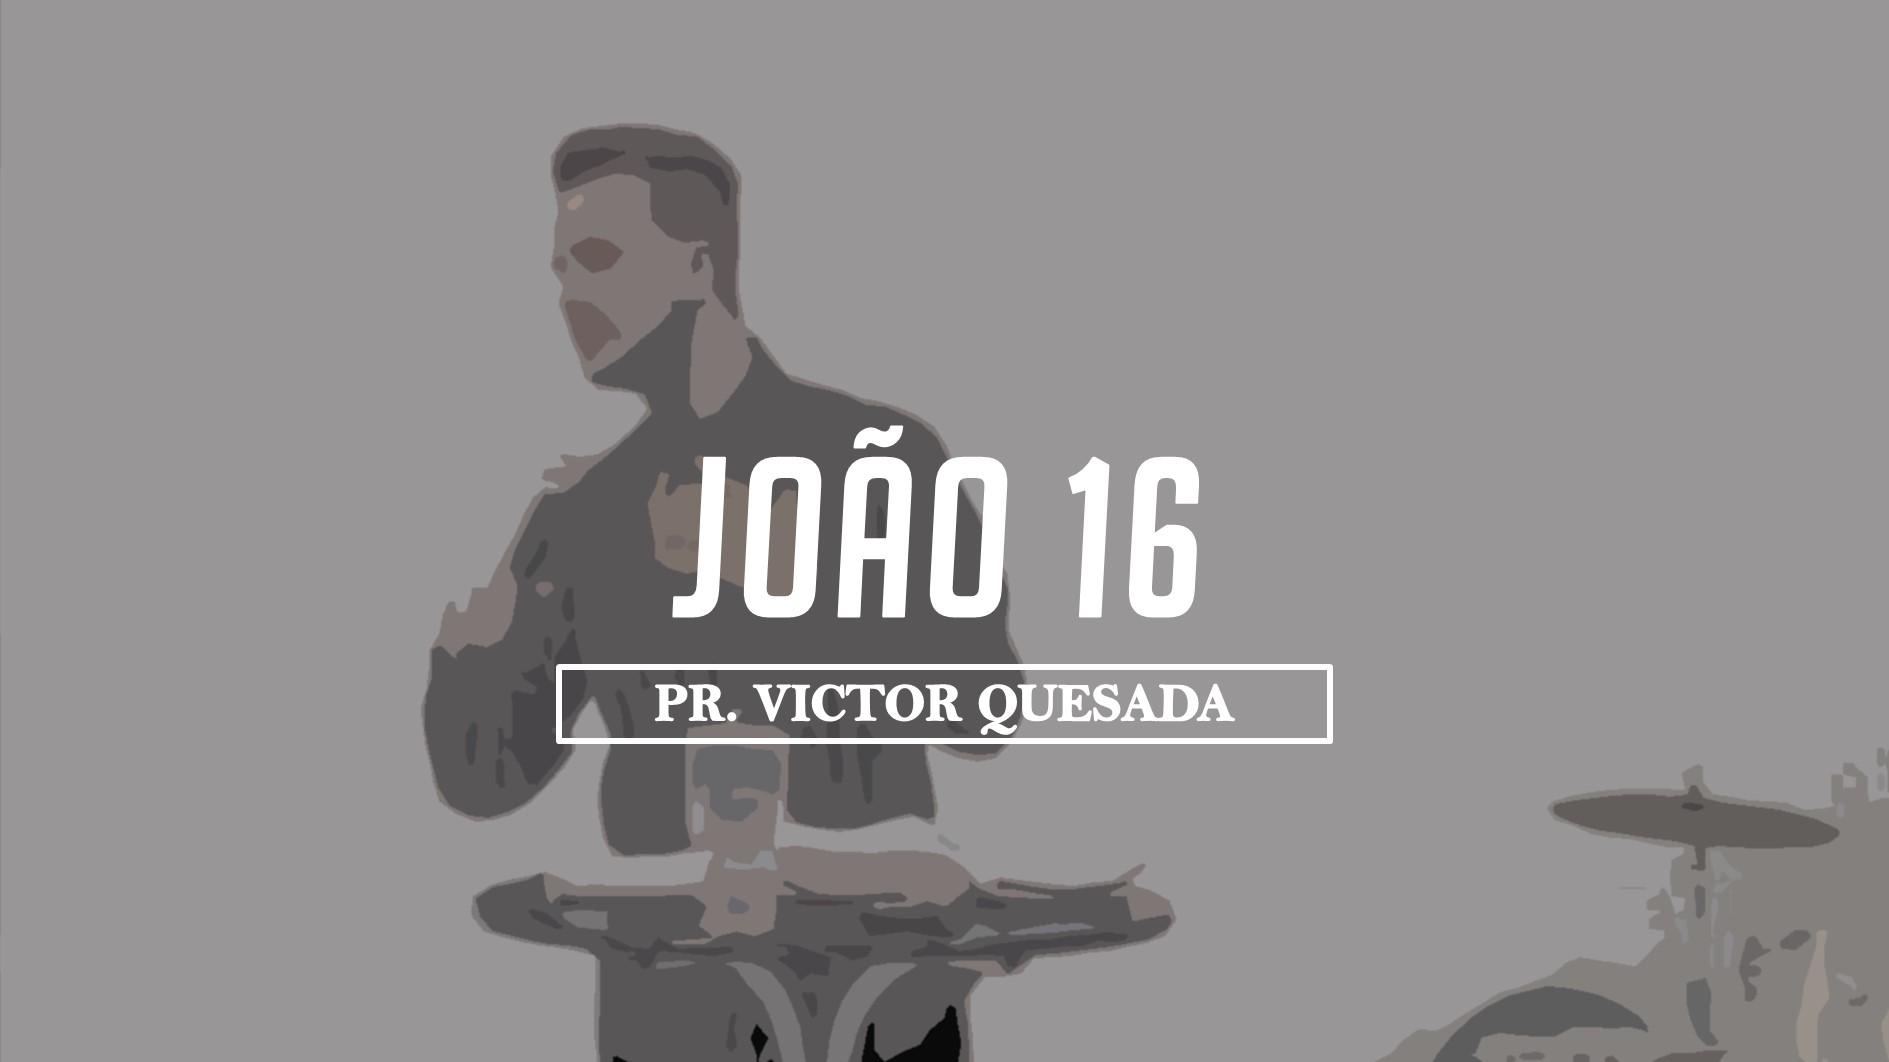 JOÃO 16 - PR. VICTOR QUESADA